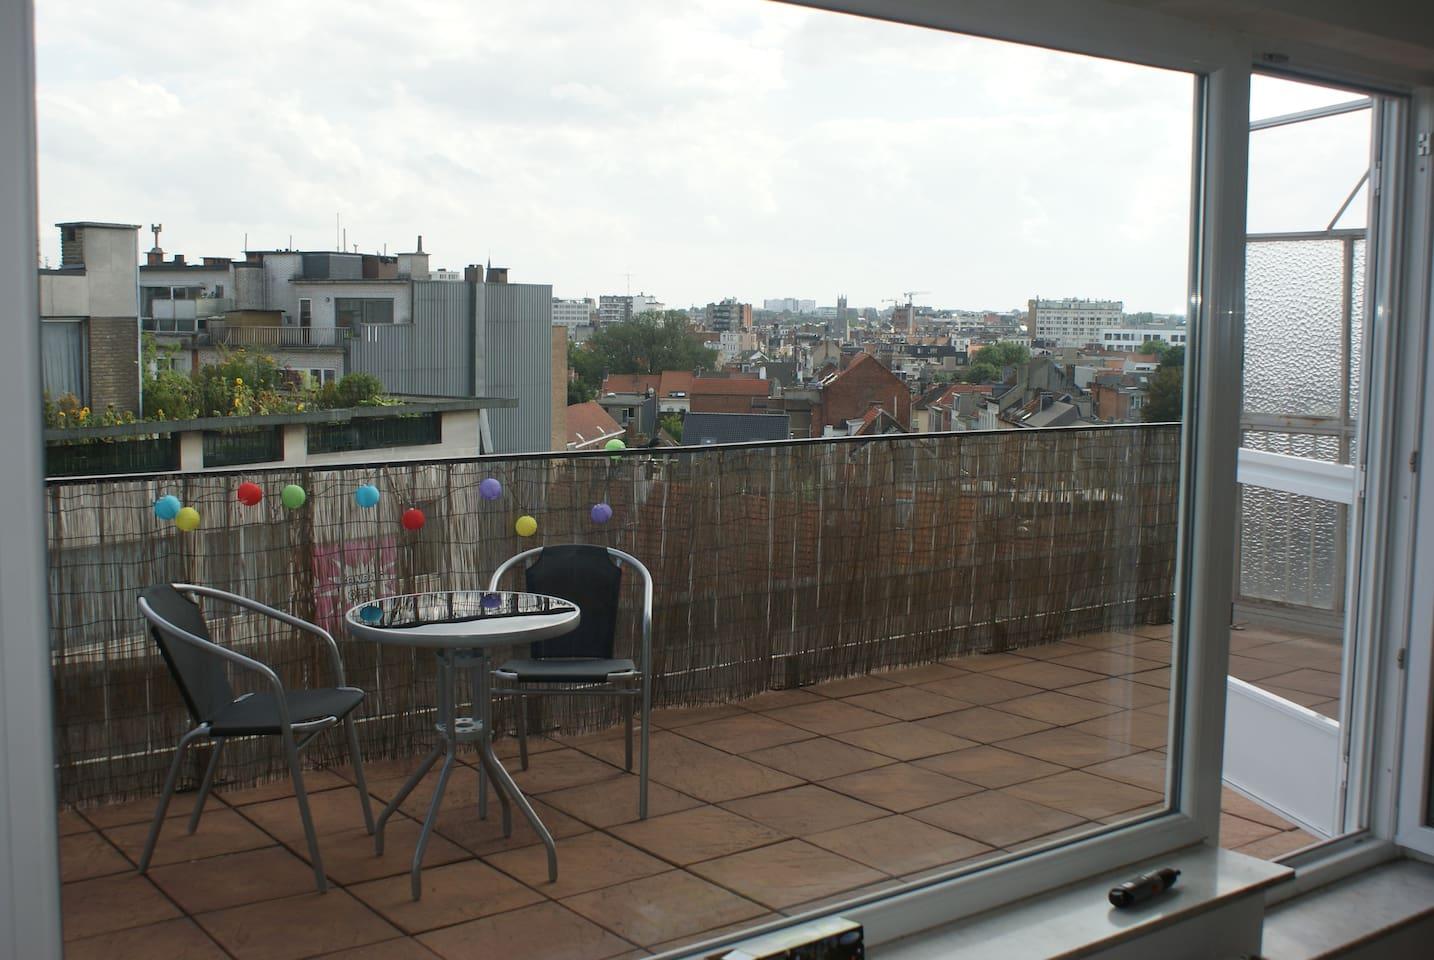 Terrace overlooking the city.